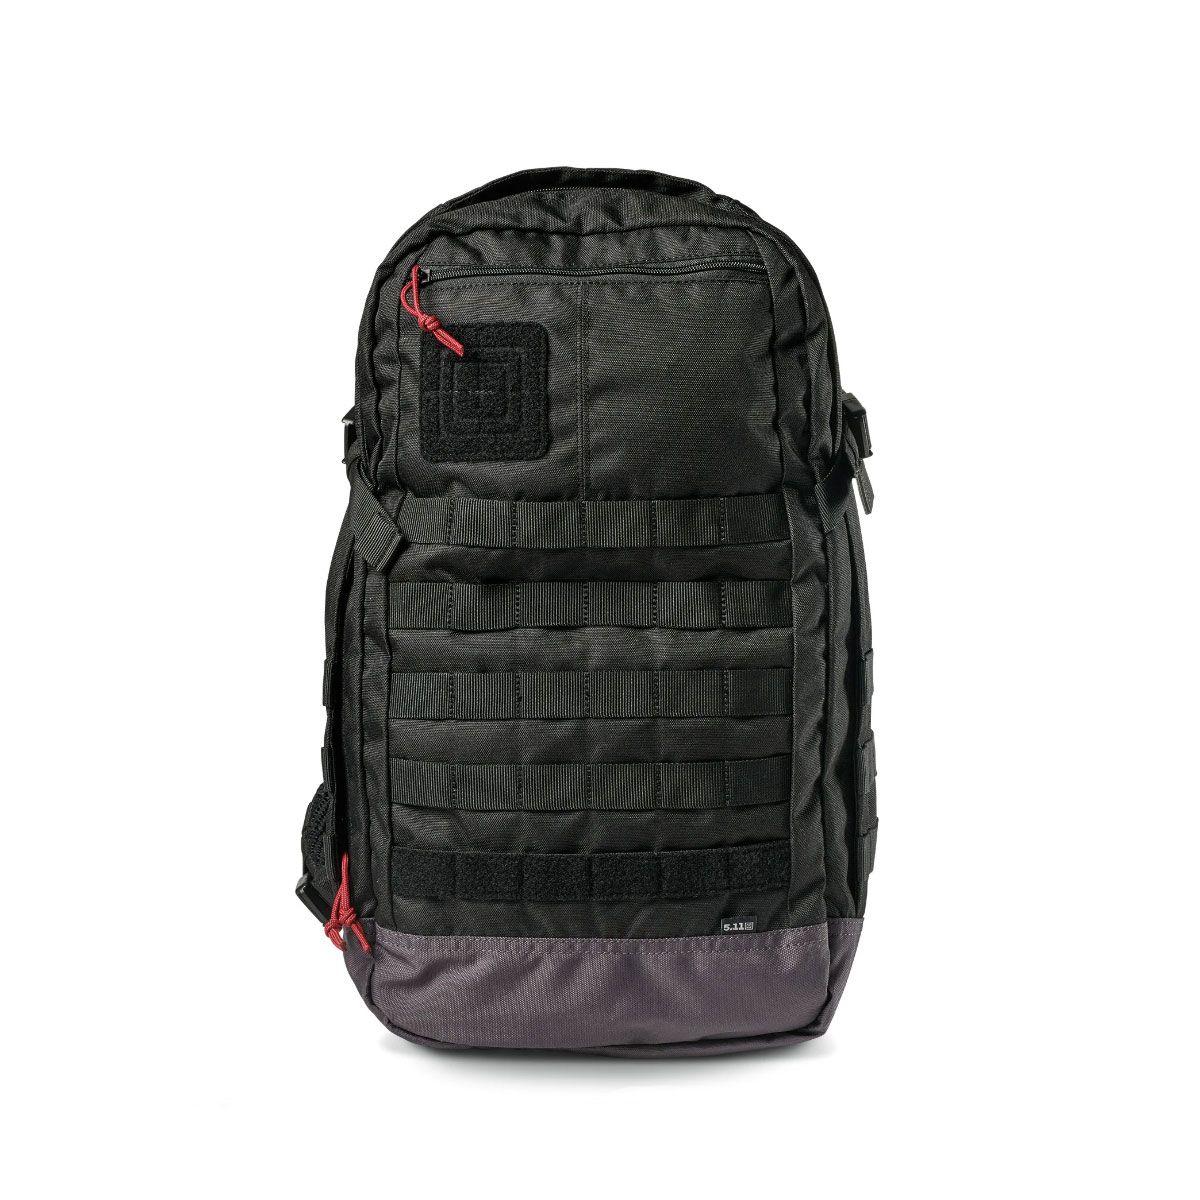 Mochila Administrativa 5.11 Tactical Rapid Origin Pack Black